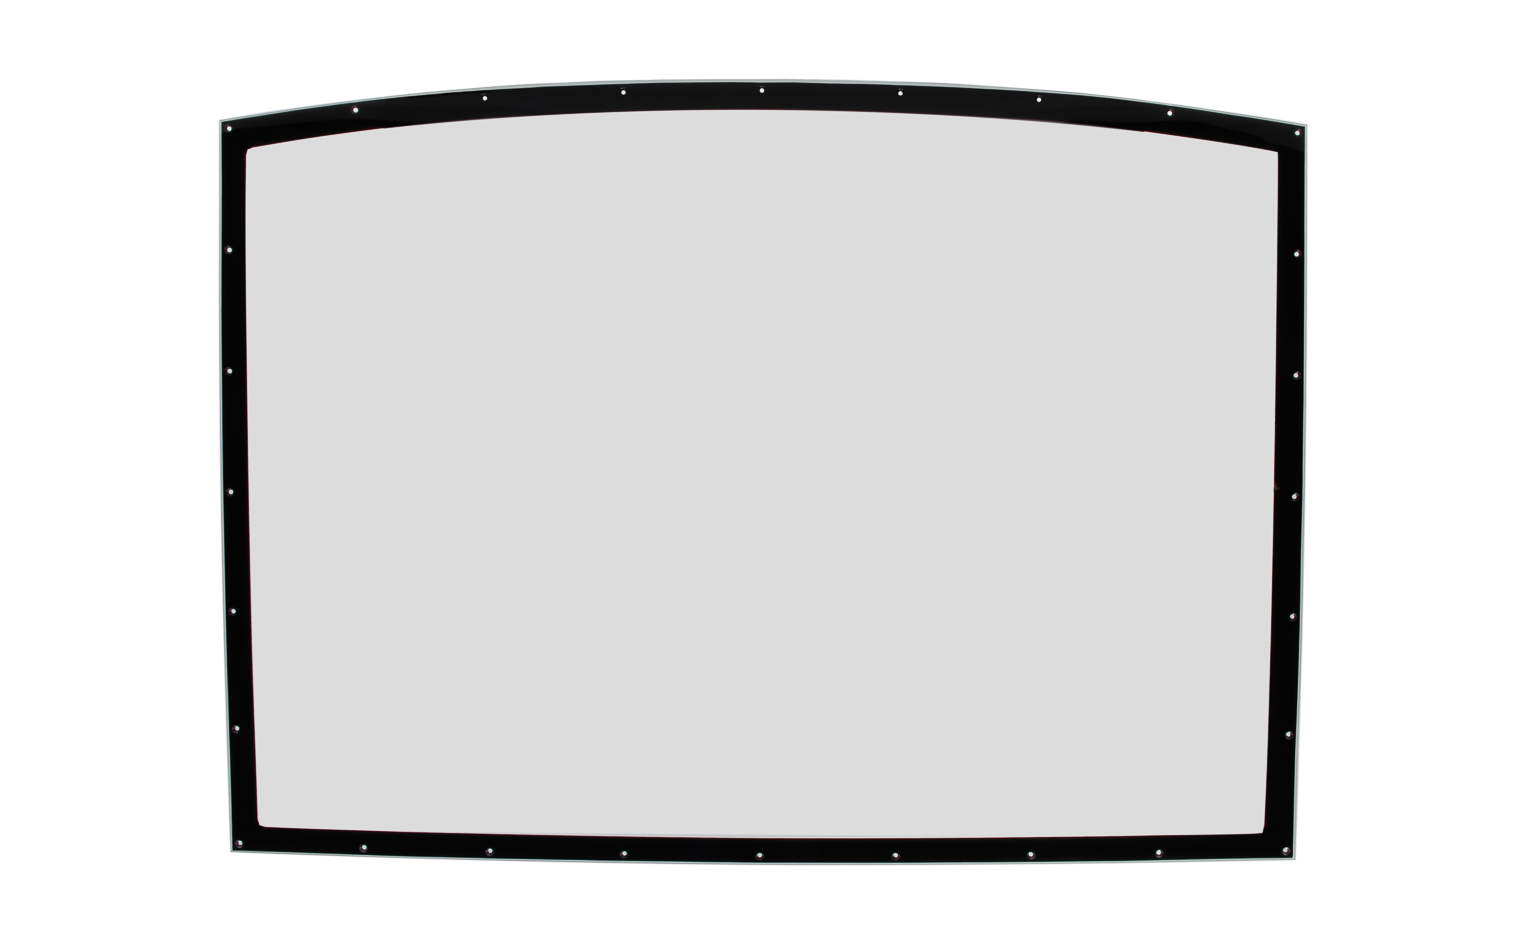 Fivestar 2019 LM Rear Window Coat ed Cut Drilled W/Black